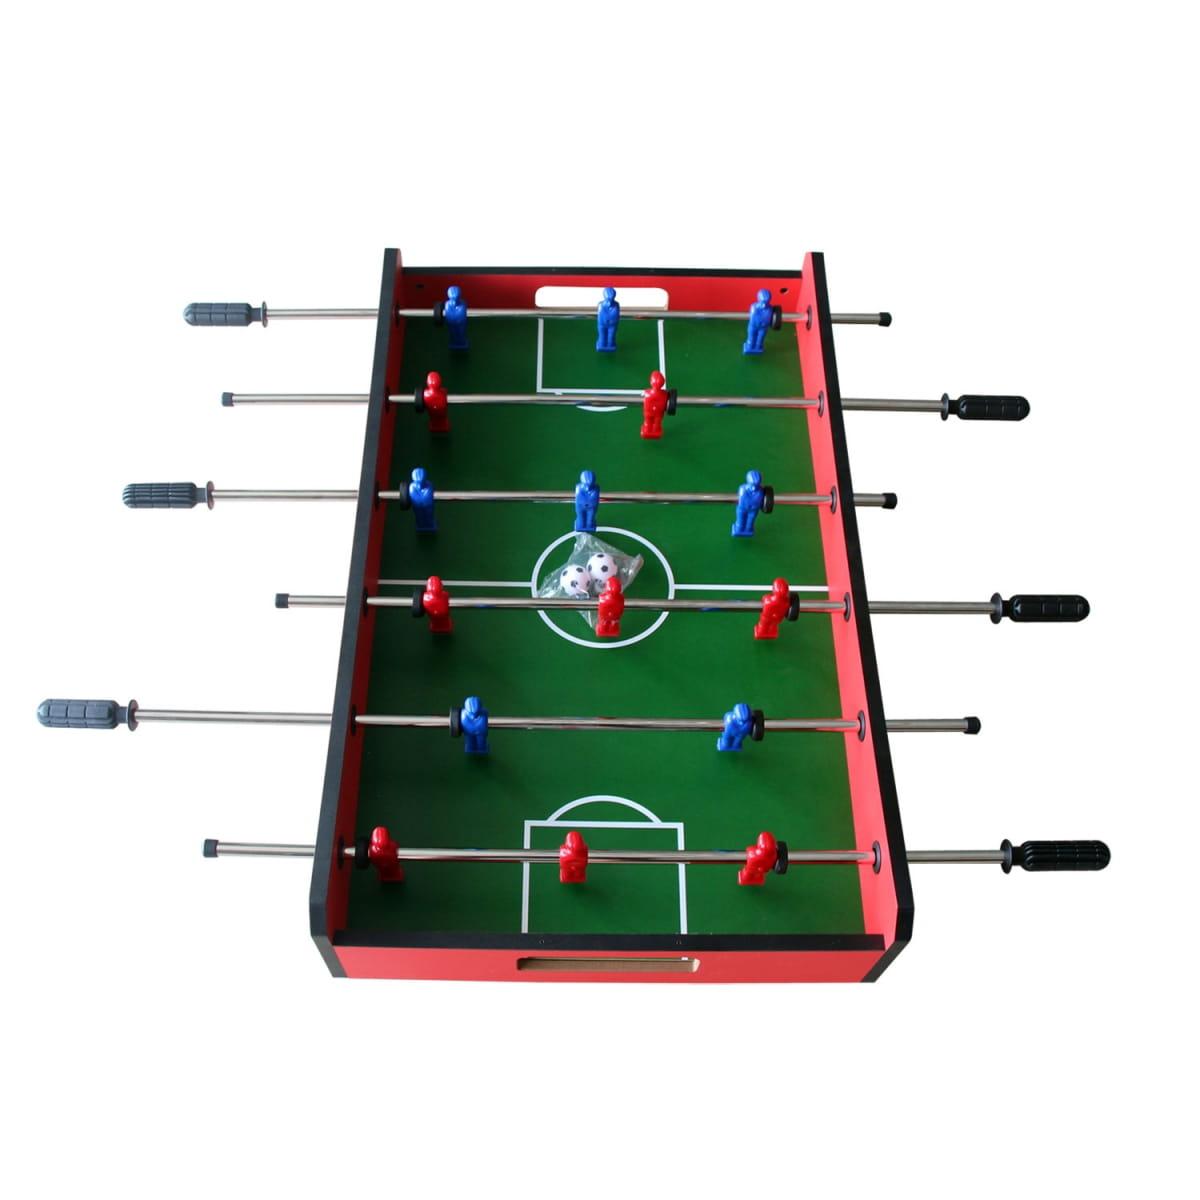 Игровой стол DFC HM-ST-36013 Футбол Torino